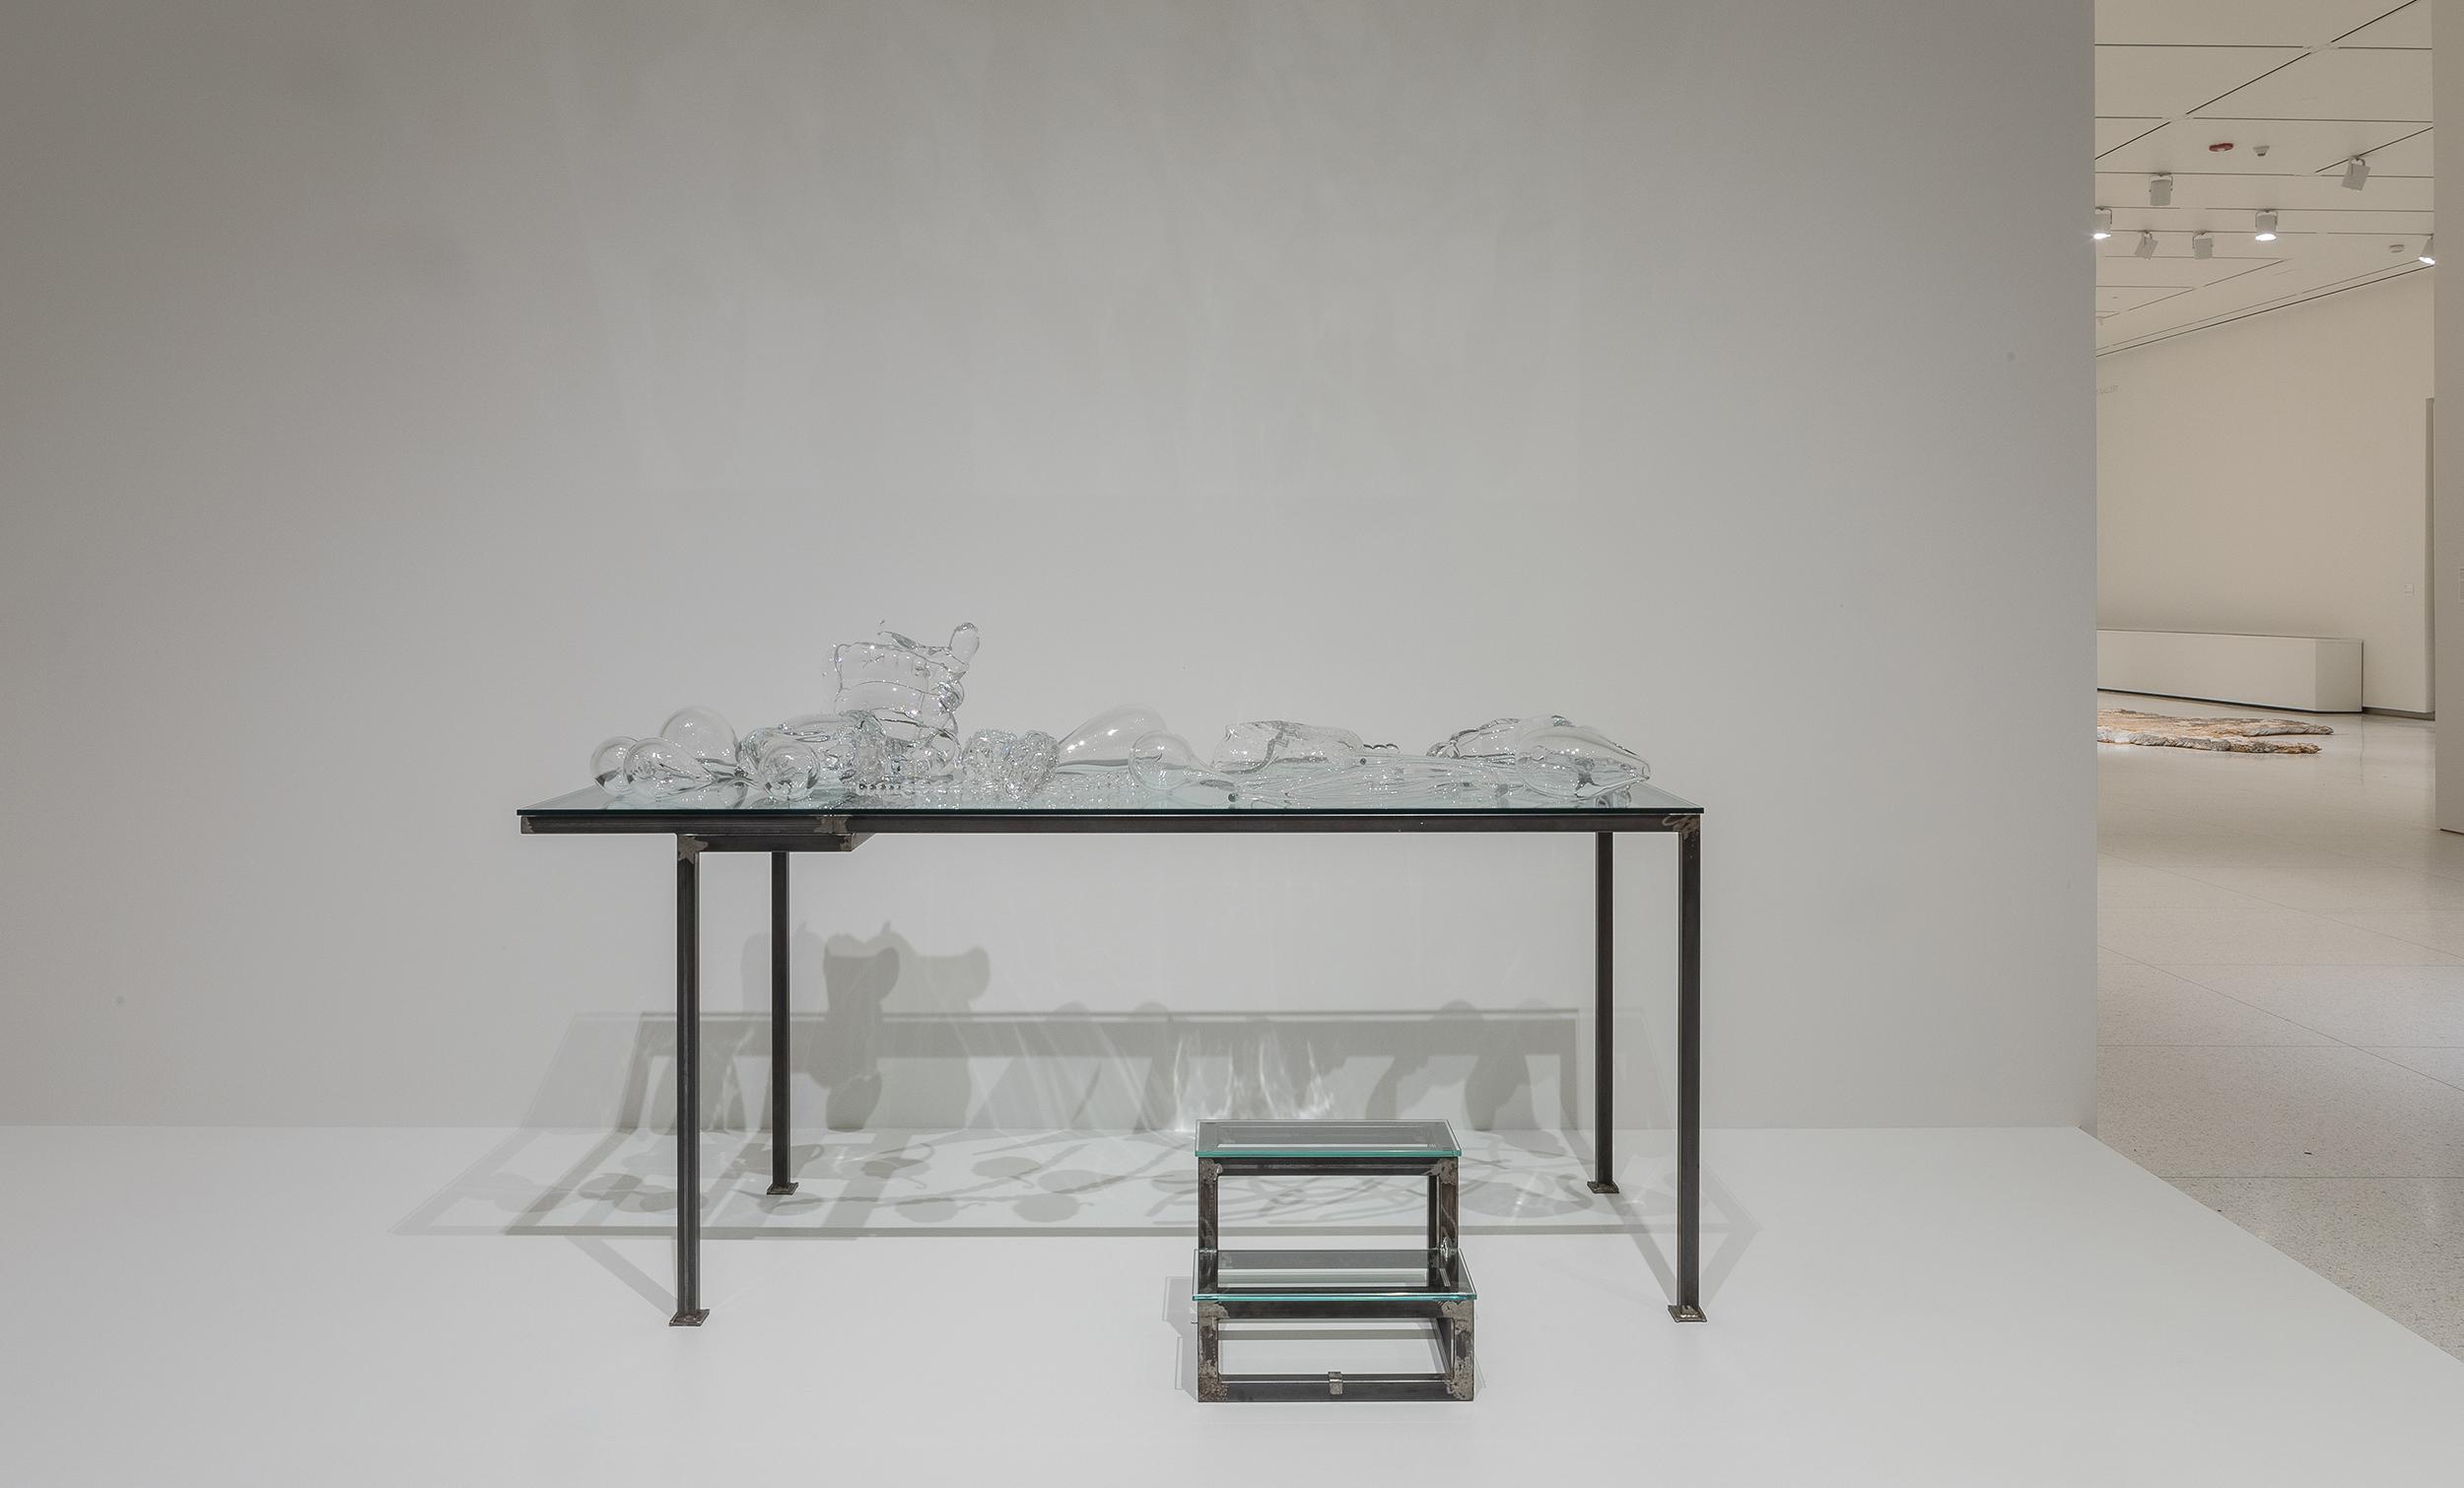 Chen Zhen, Crystal Landscape of Inner Body, 2000